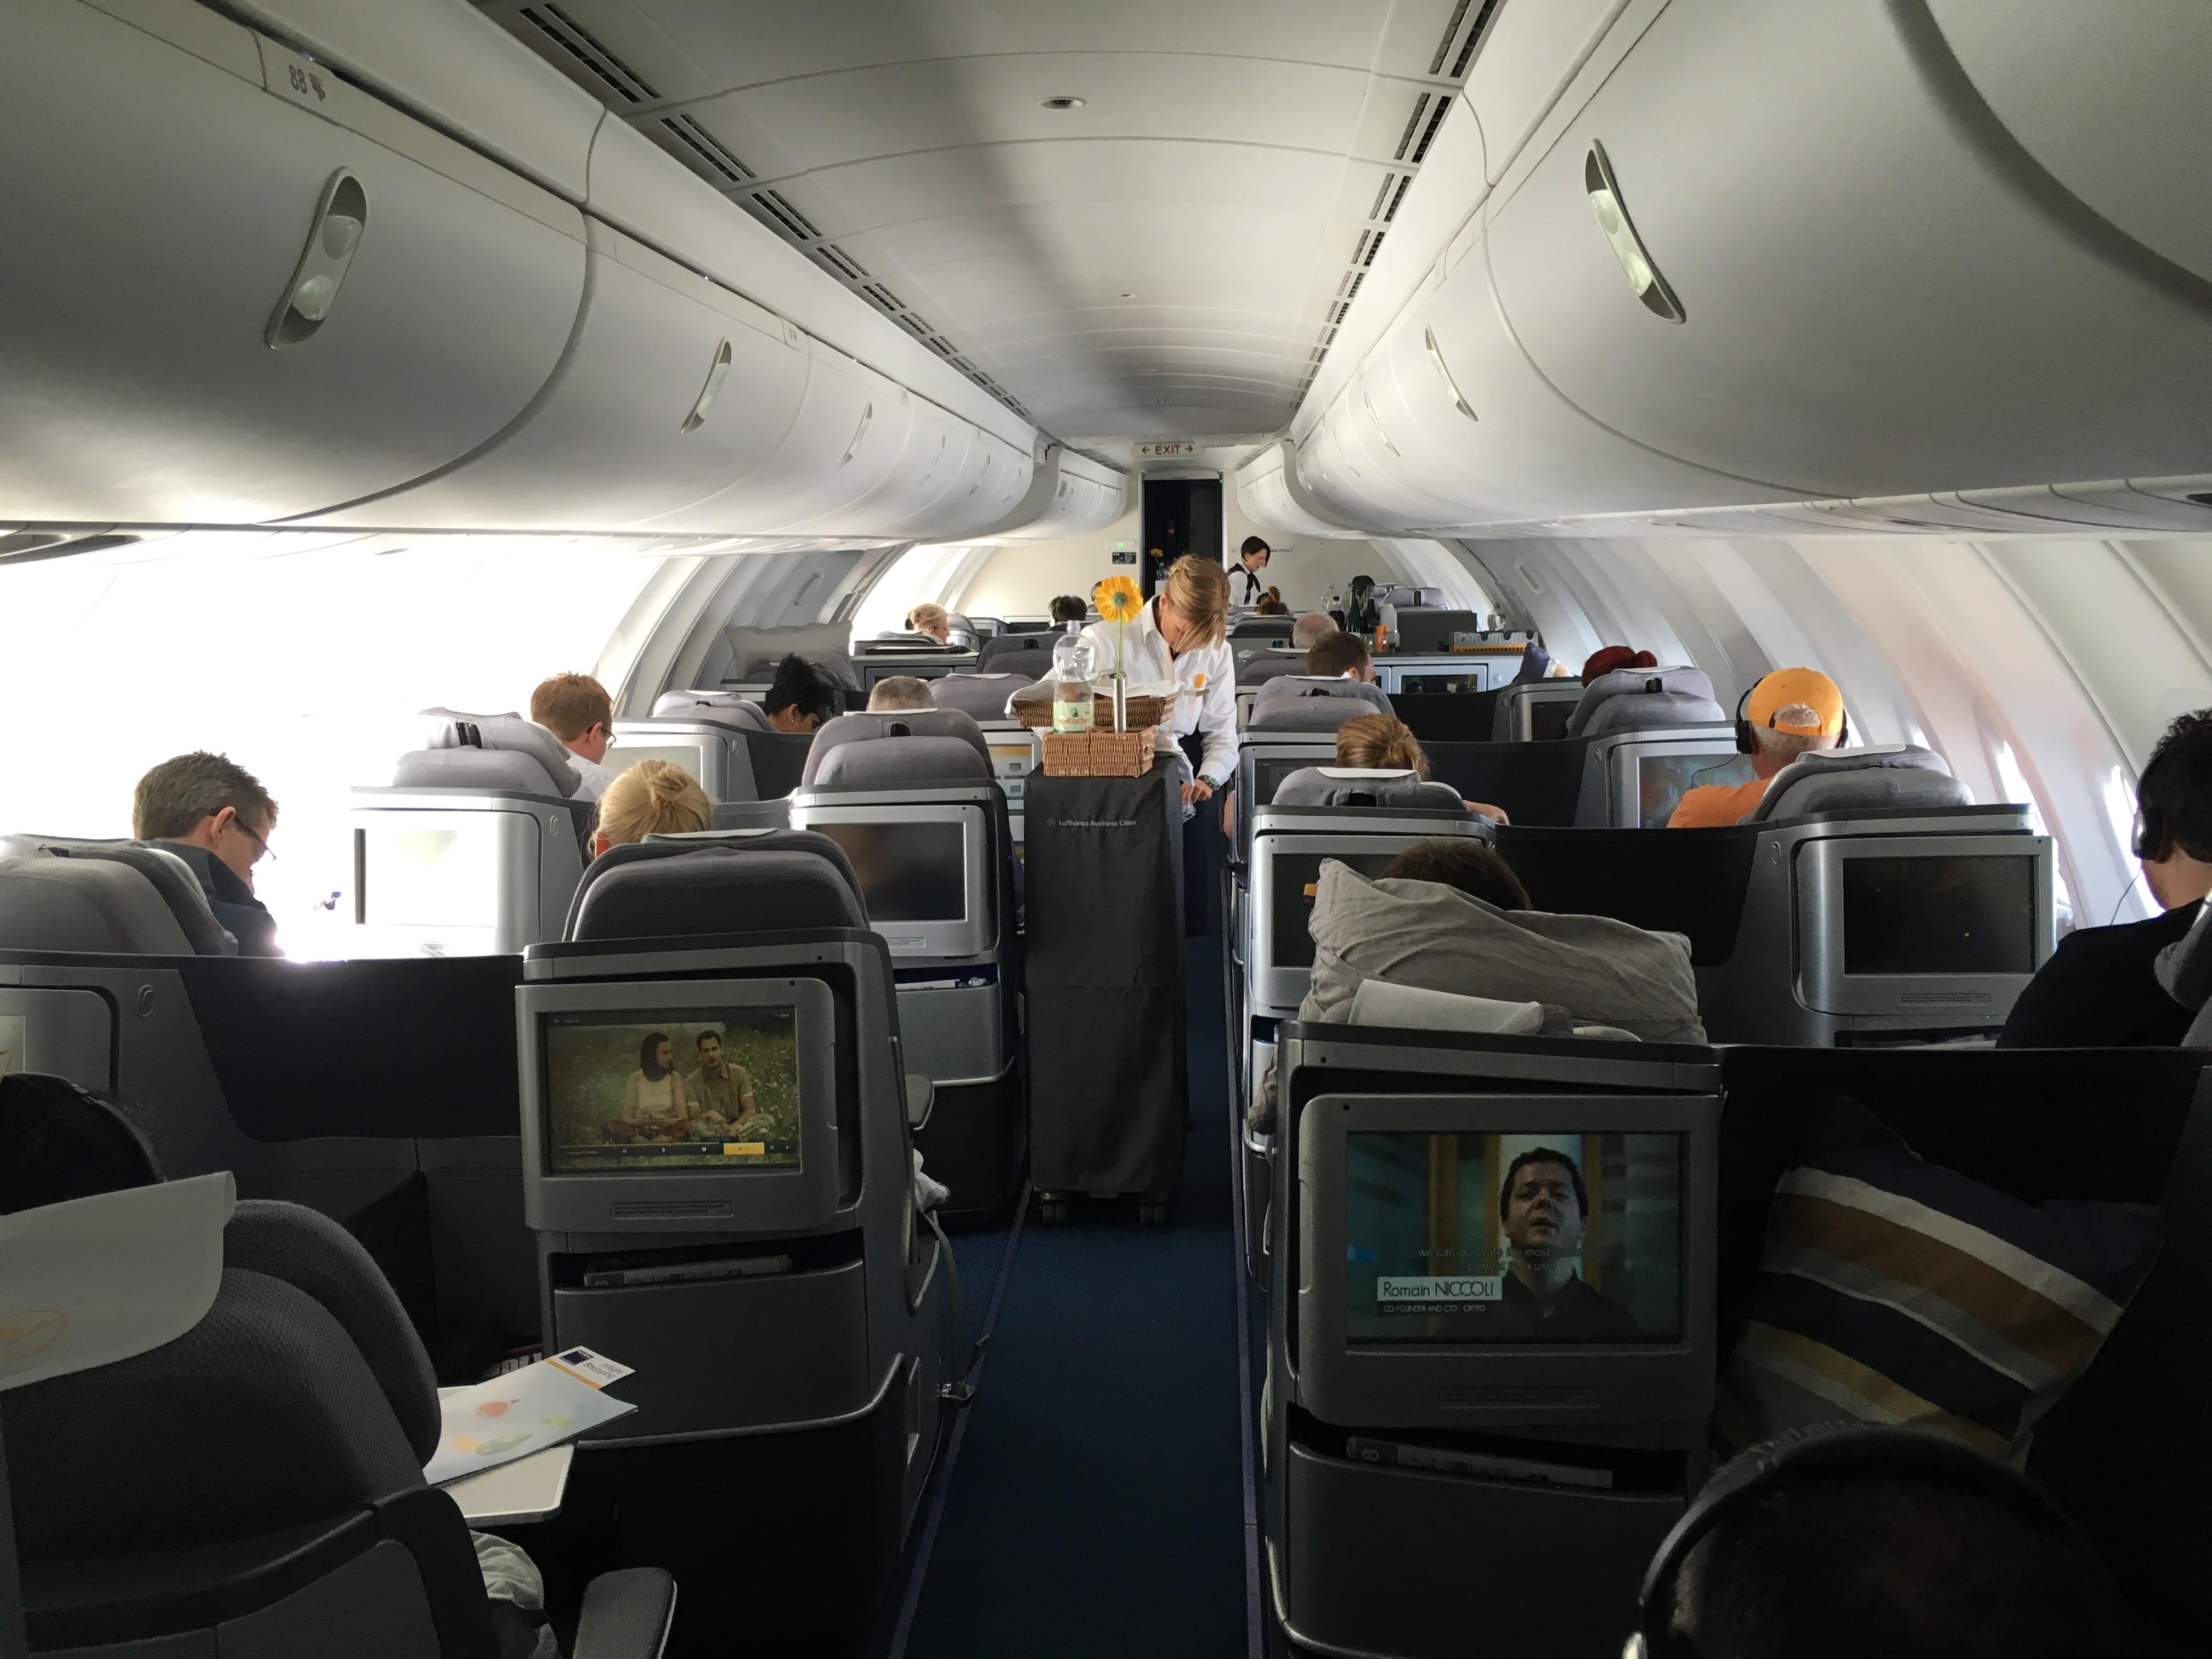 Lufthansa-Business-Class-Flug-11-e1469988446663.jpg